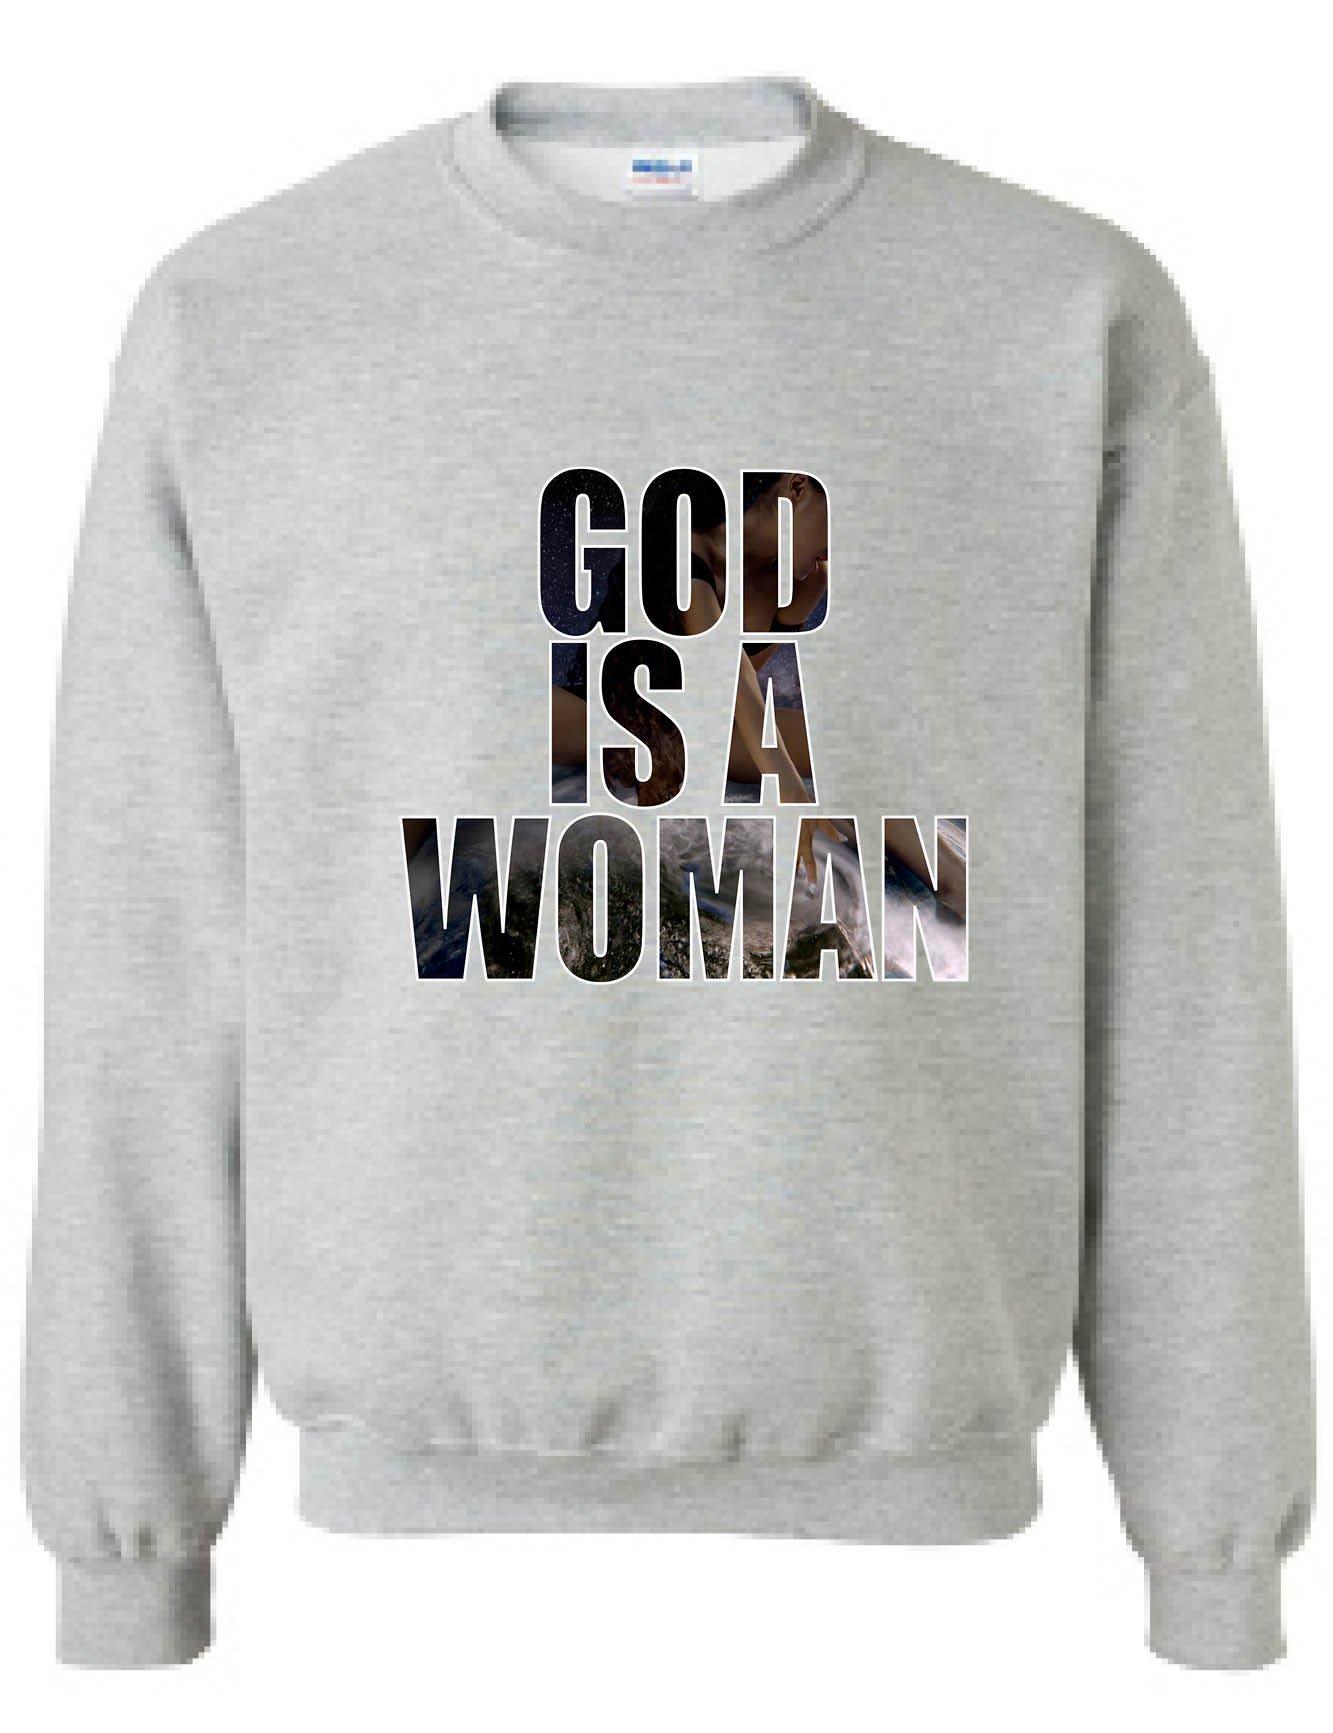 Allntrends Adult Sweatshirt God is A Woman Trendy Top Hot Fans Popular Gift (3XL, Sporty Grey)